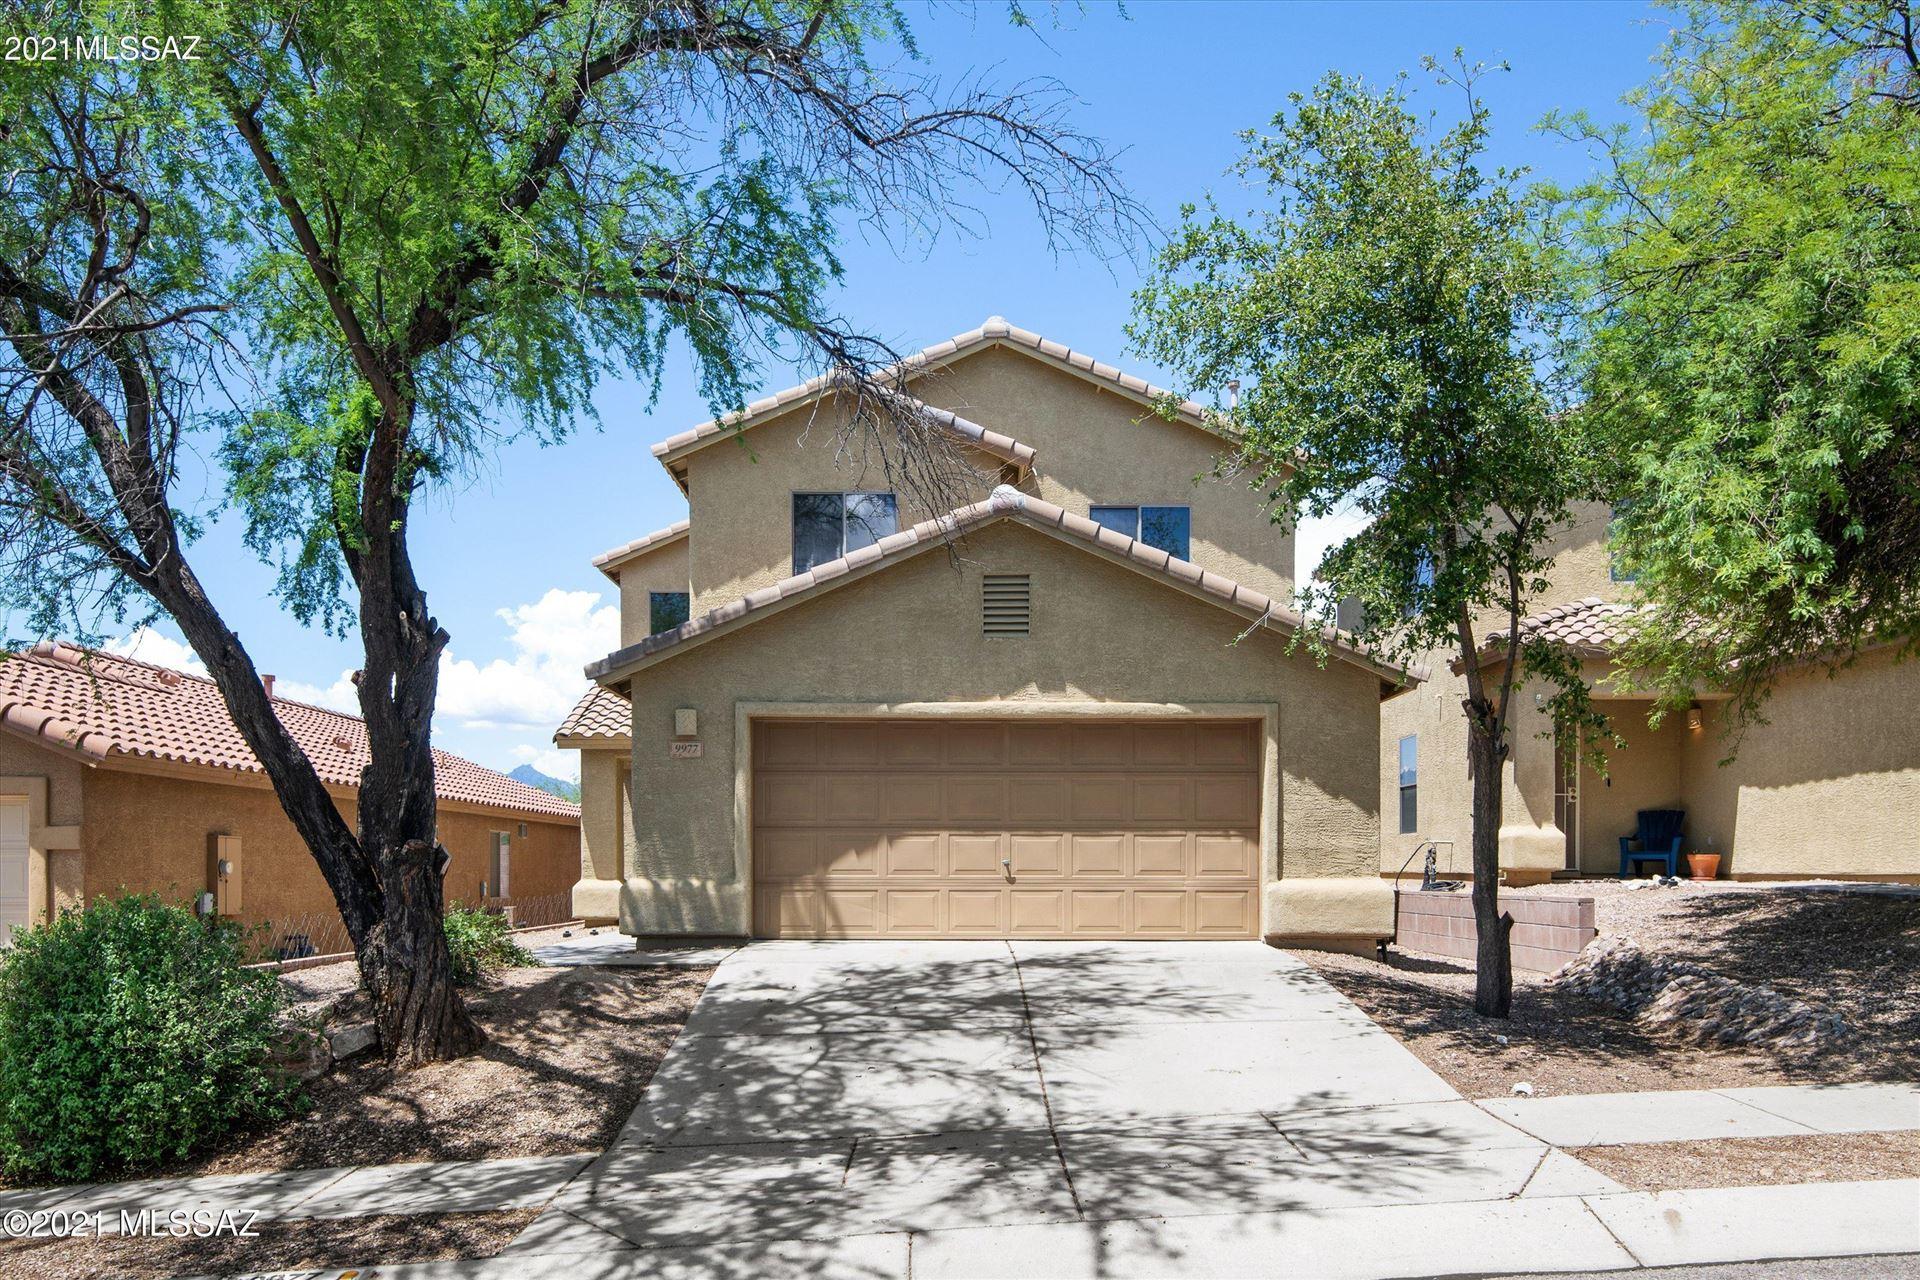 9977 E Emberwood Drive, Tucson, AZ 85748 - MLS#: 22118820